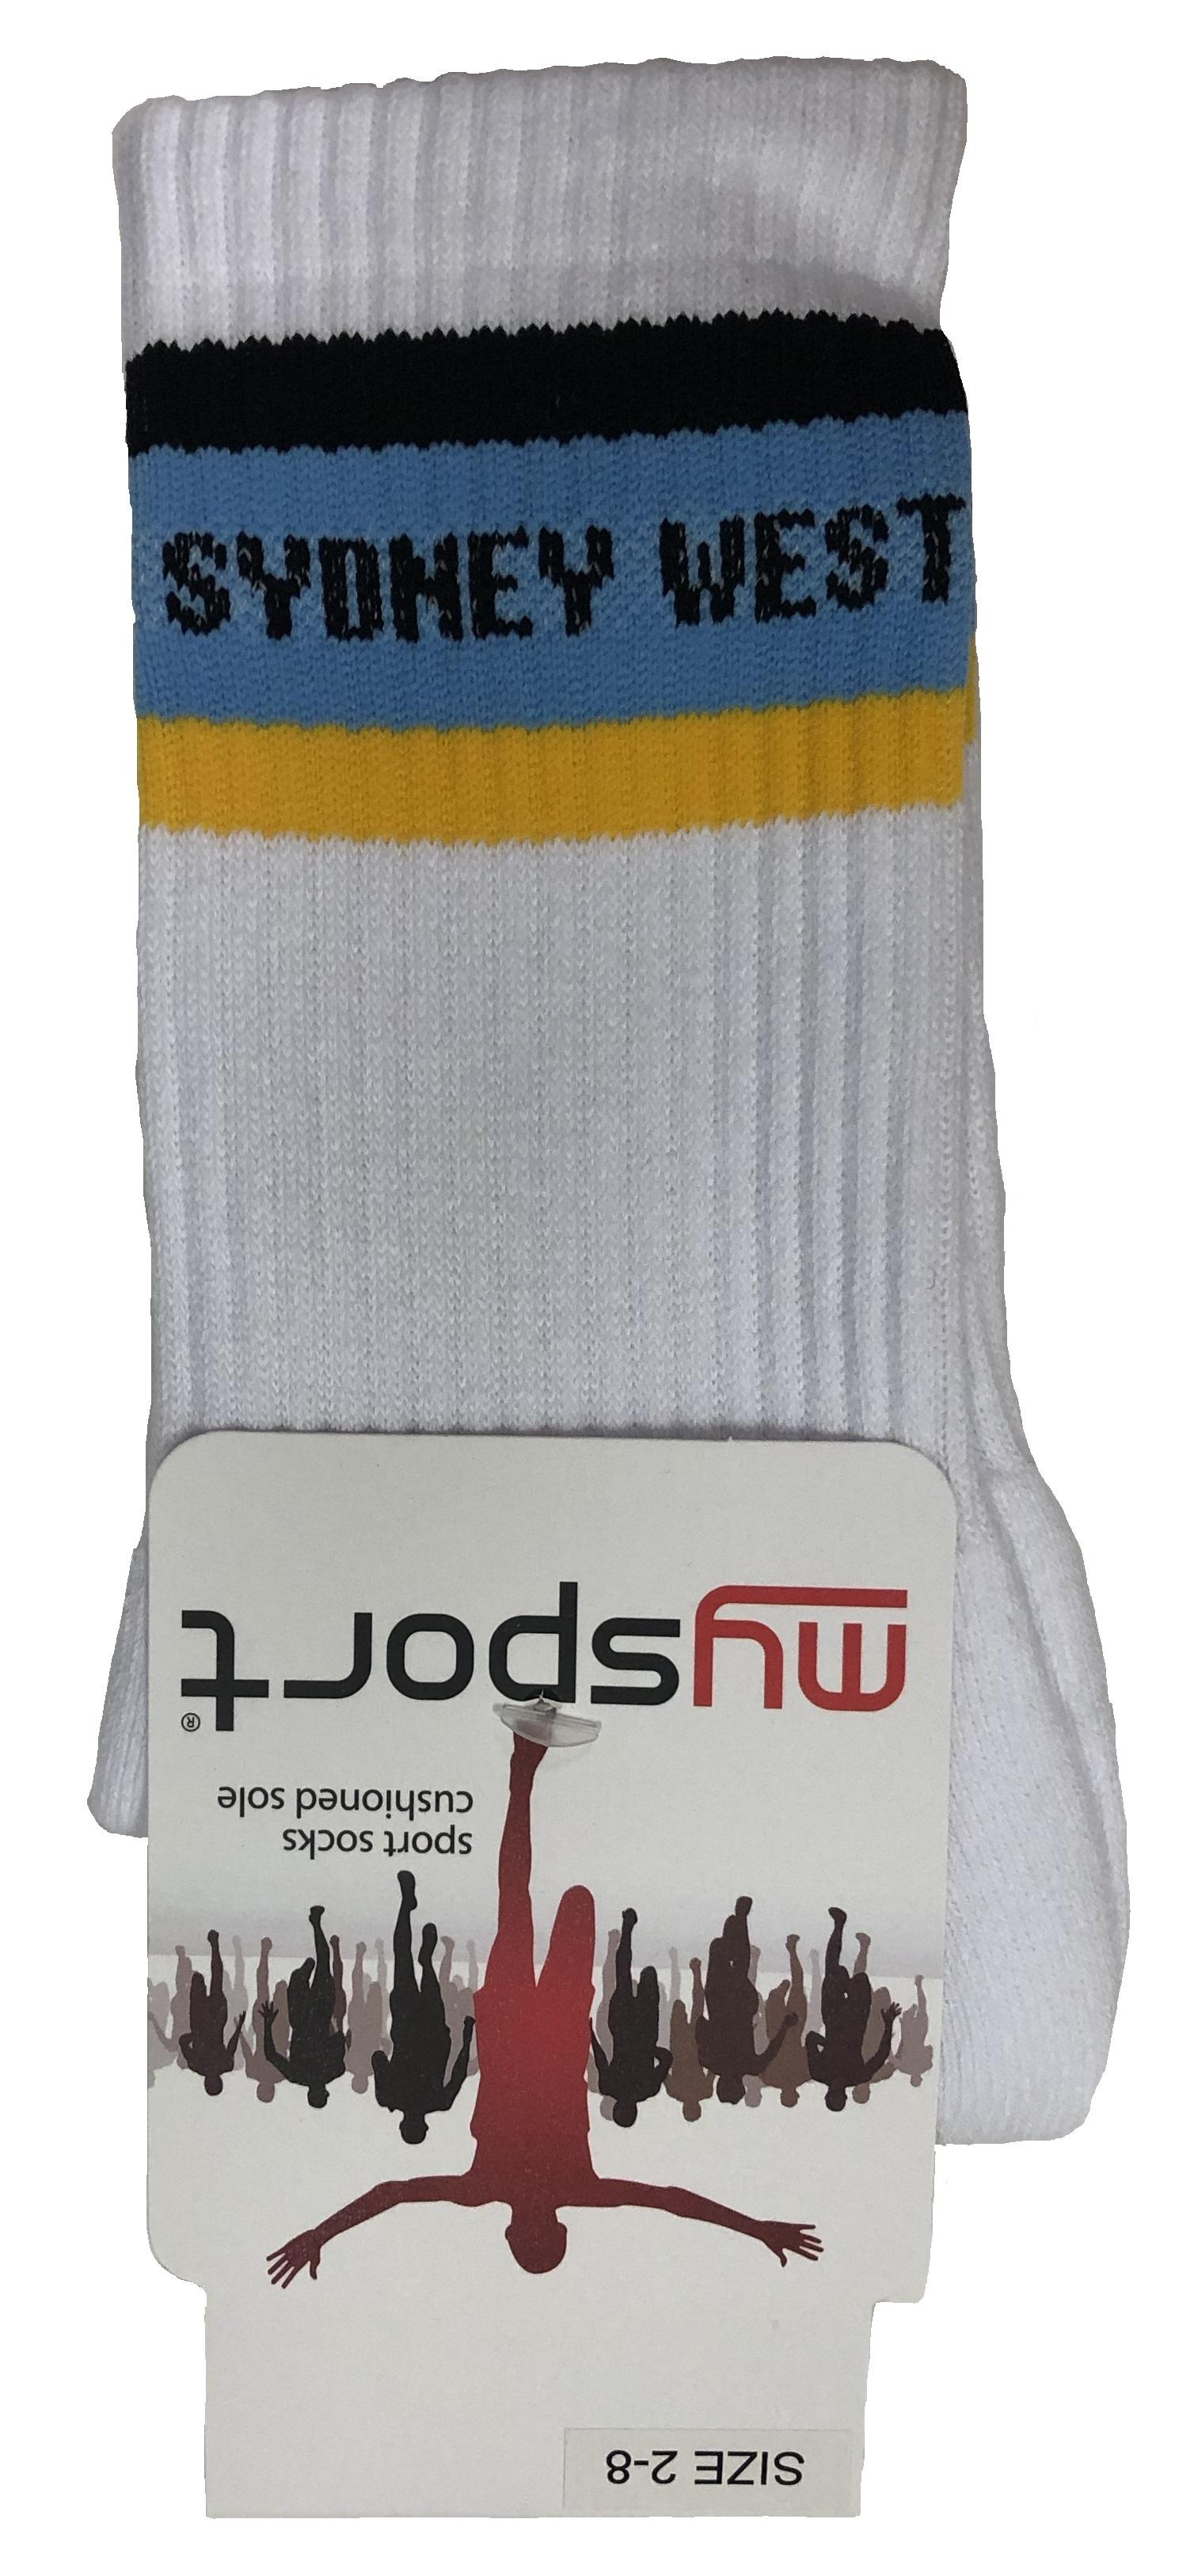 SW Sports socks